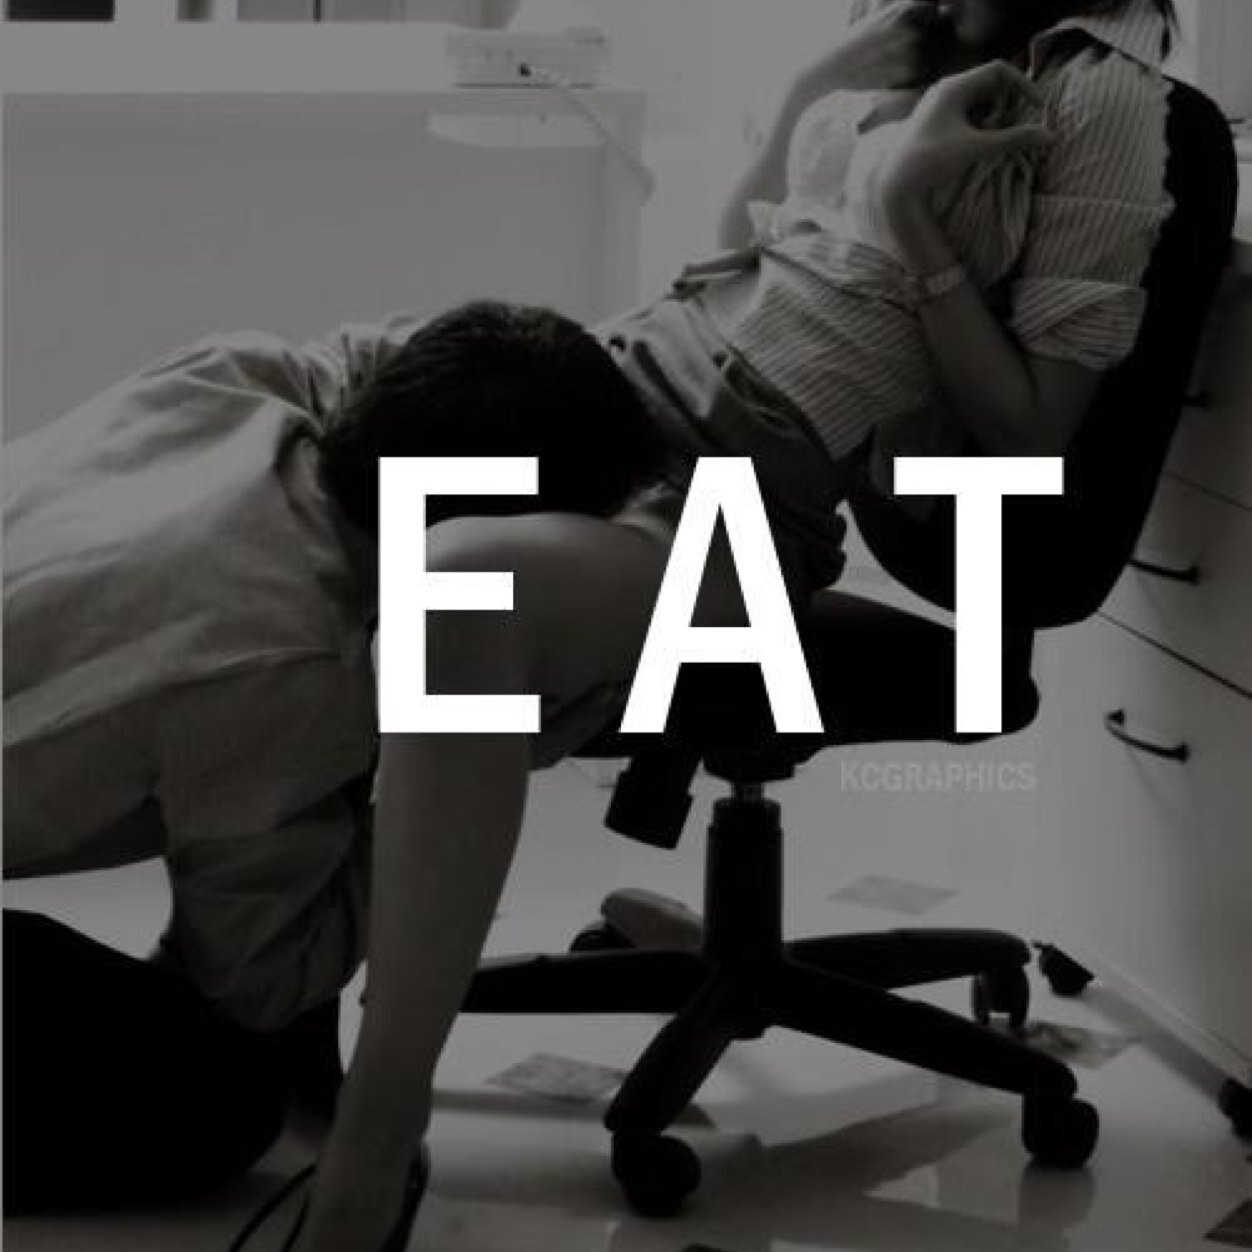 eatthatpussy